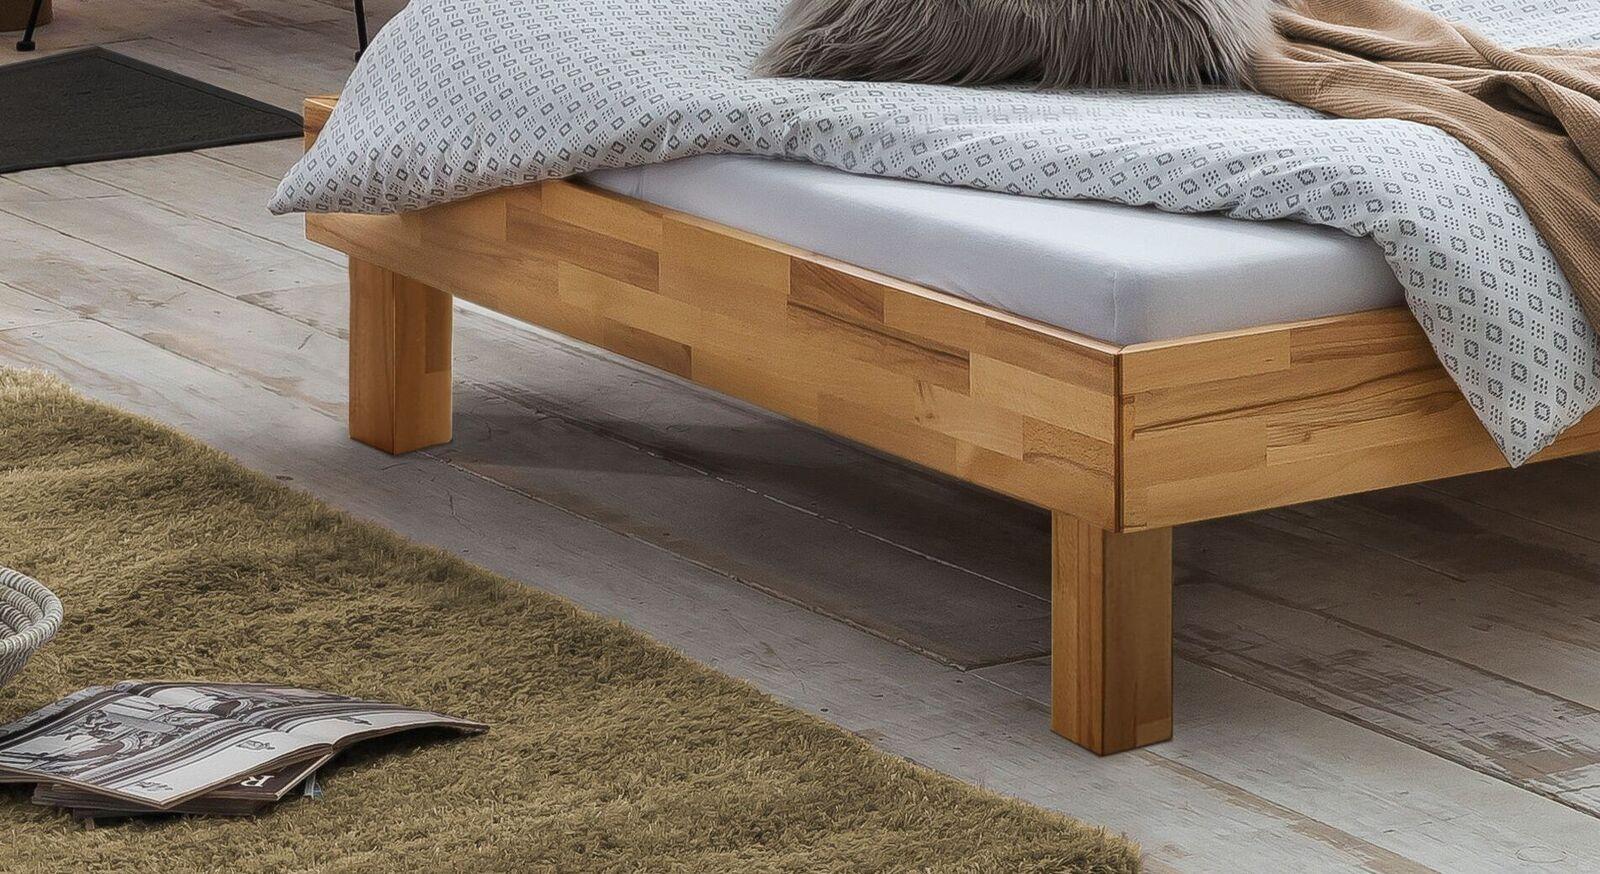 Bett Amsden mit robusten Blockfüßen